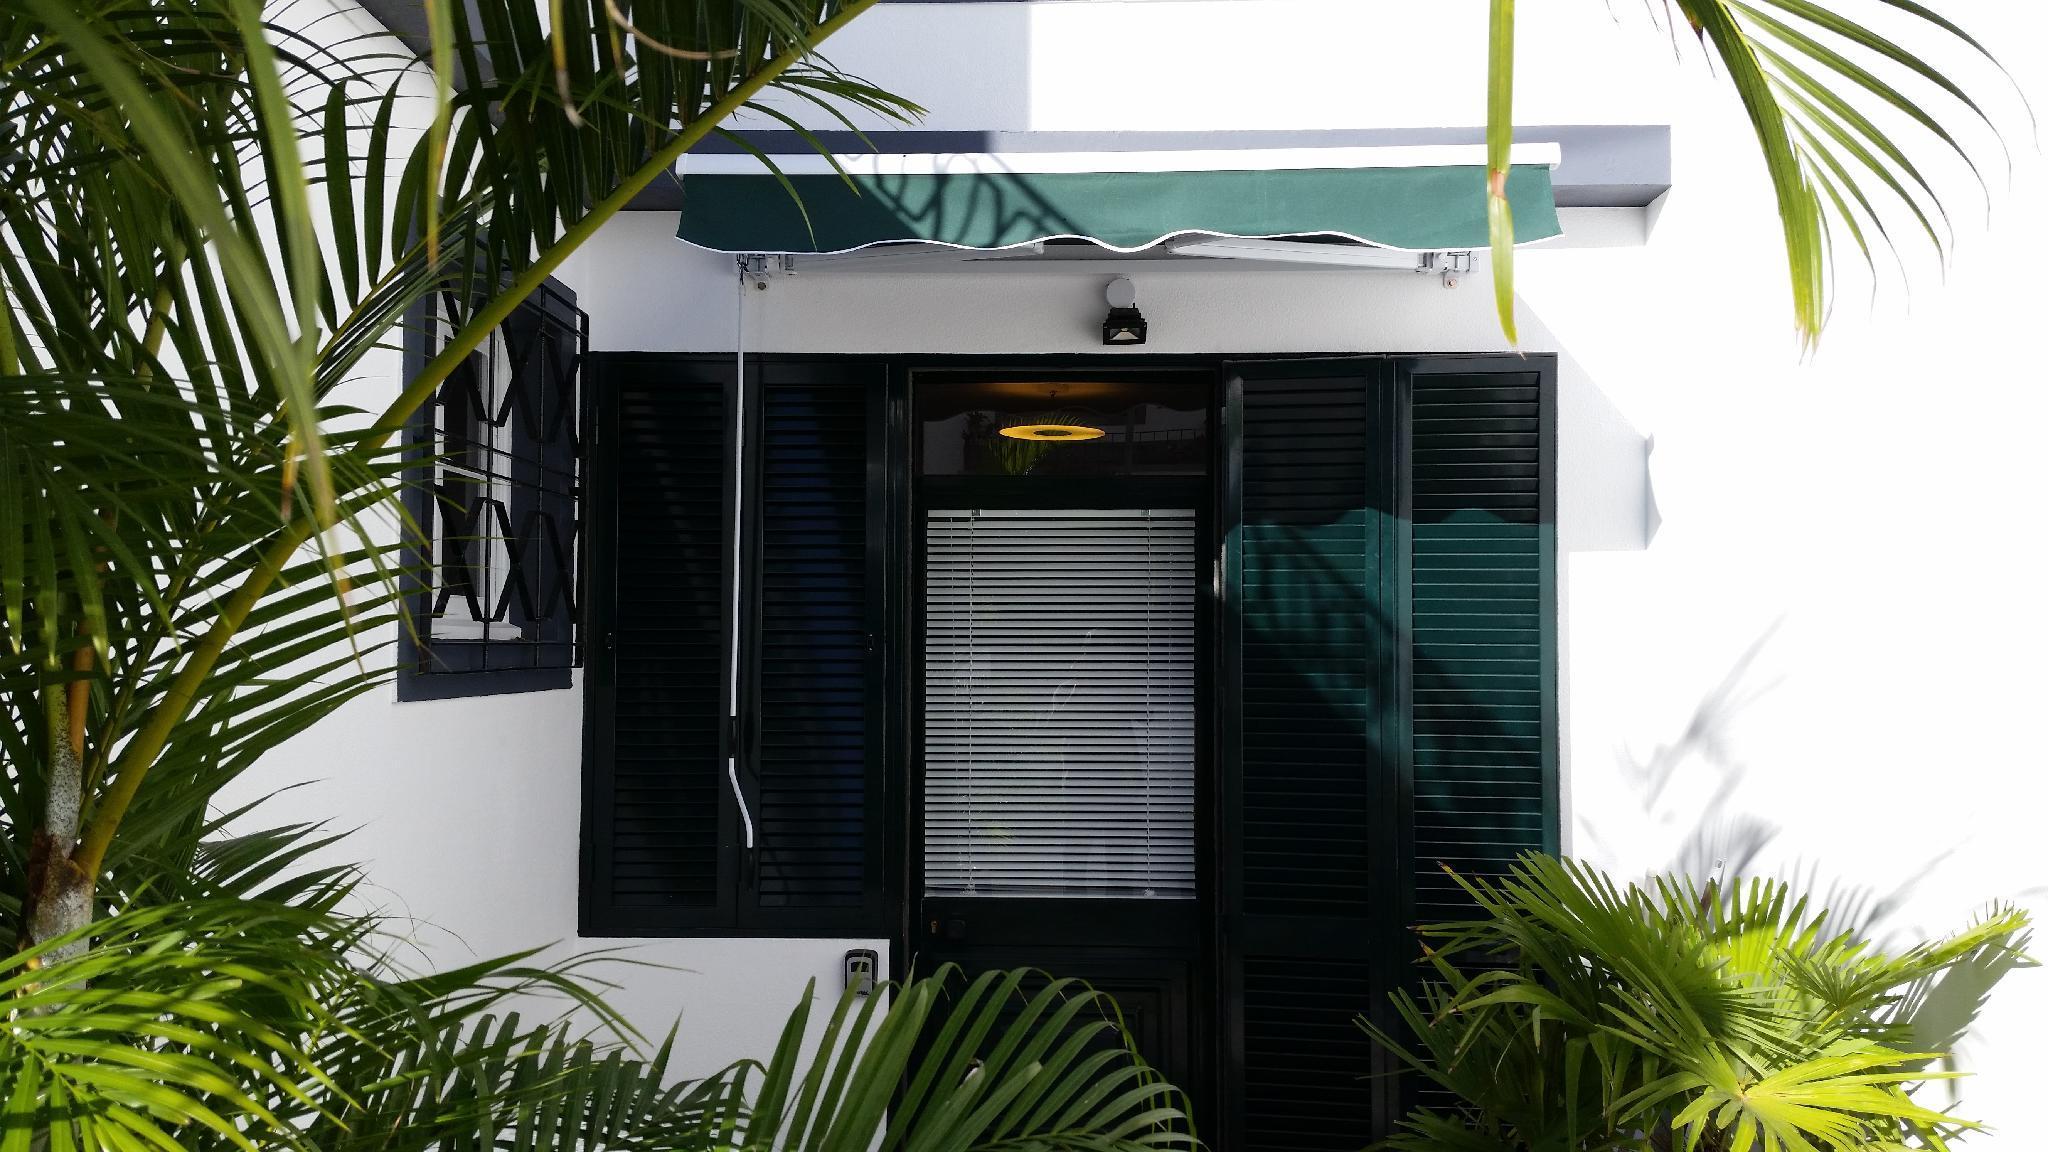 Light Breeze Terrace Apartment